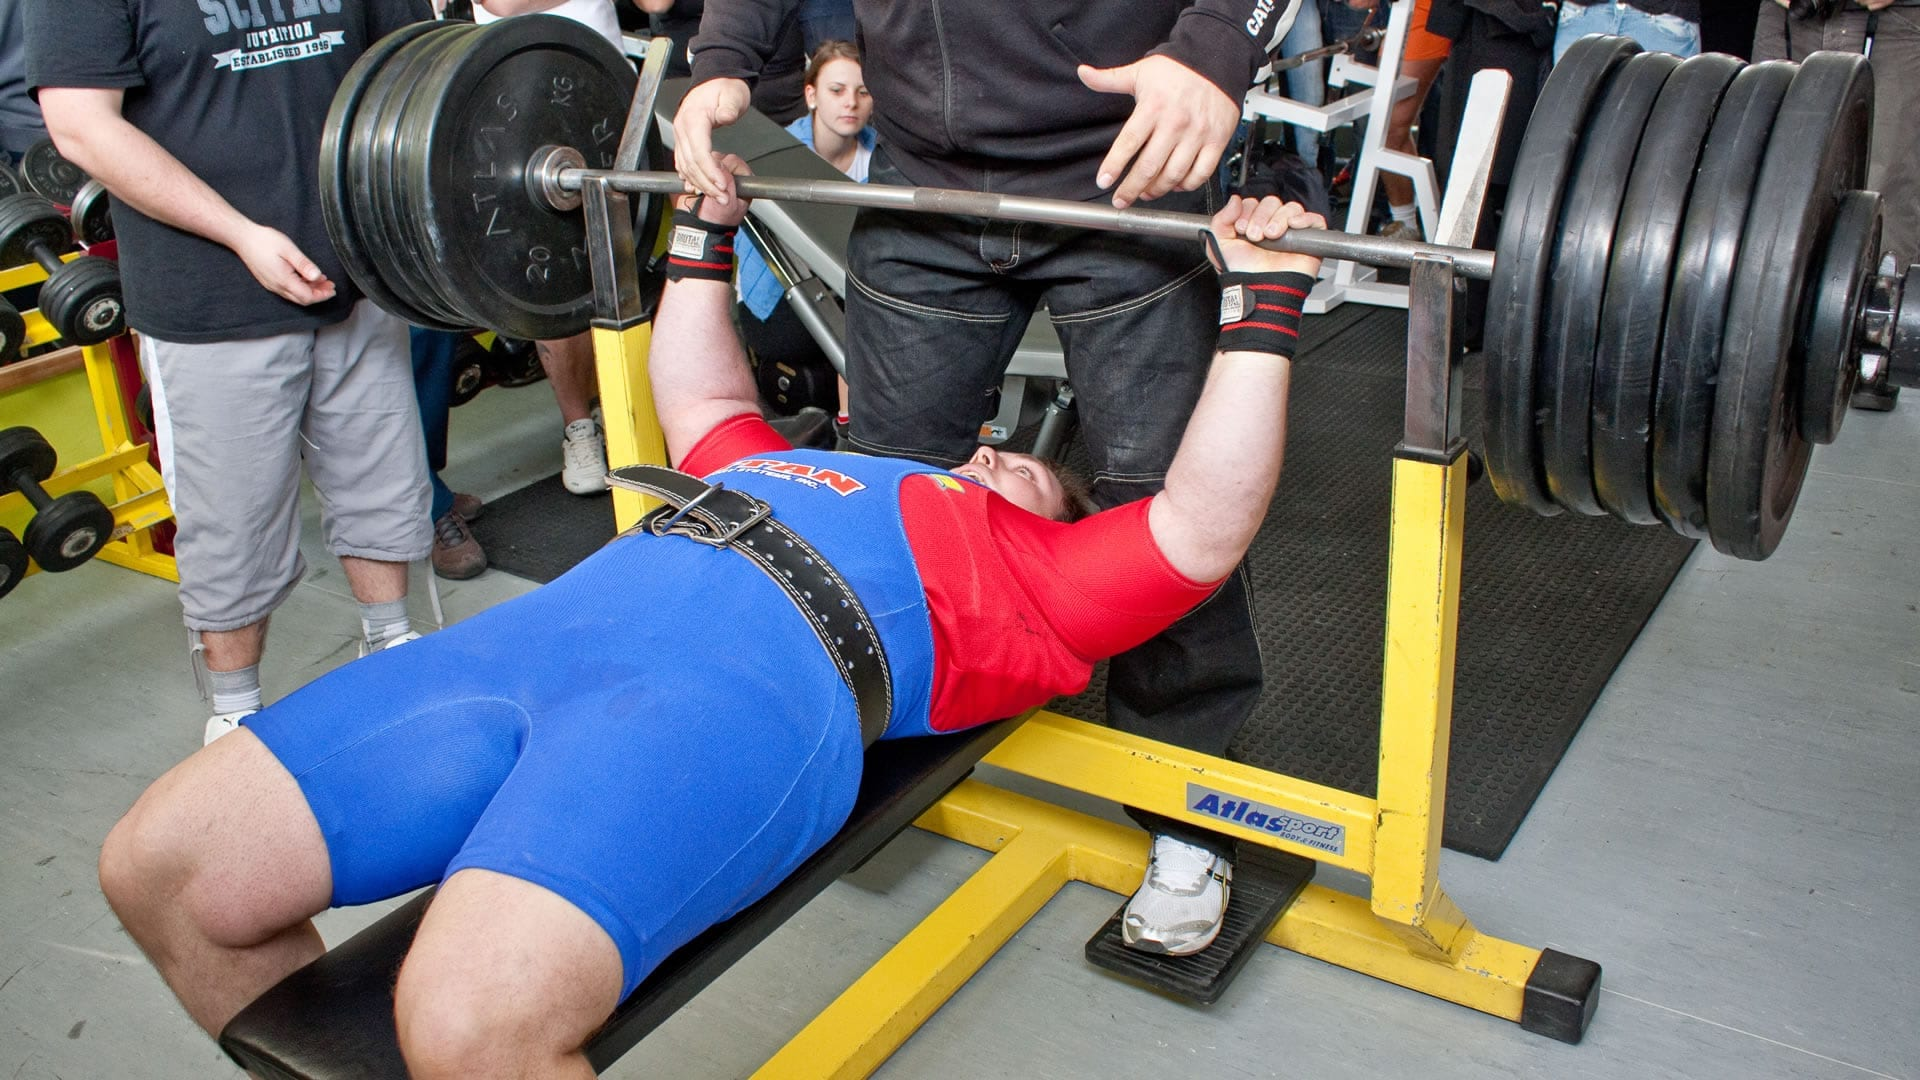 El sistema nervioso, fuerza e hipertrofia | Cambiatufisico